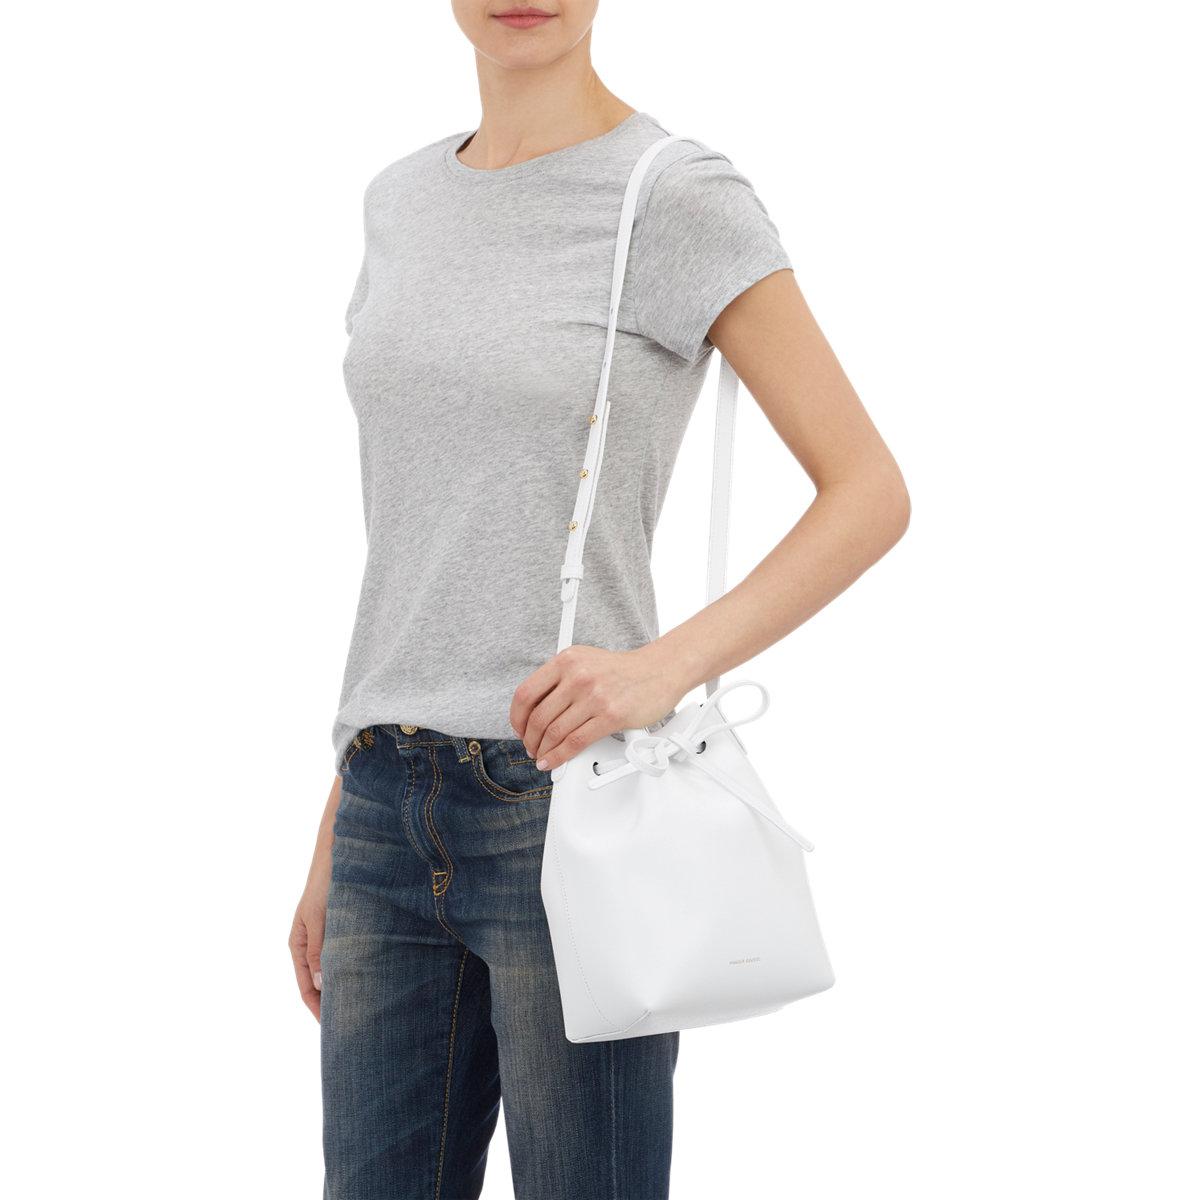 Mansur Gavriel Mini Bucket Bag In White Lyst